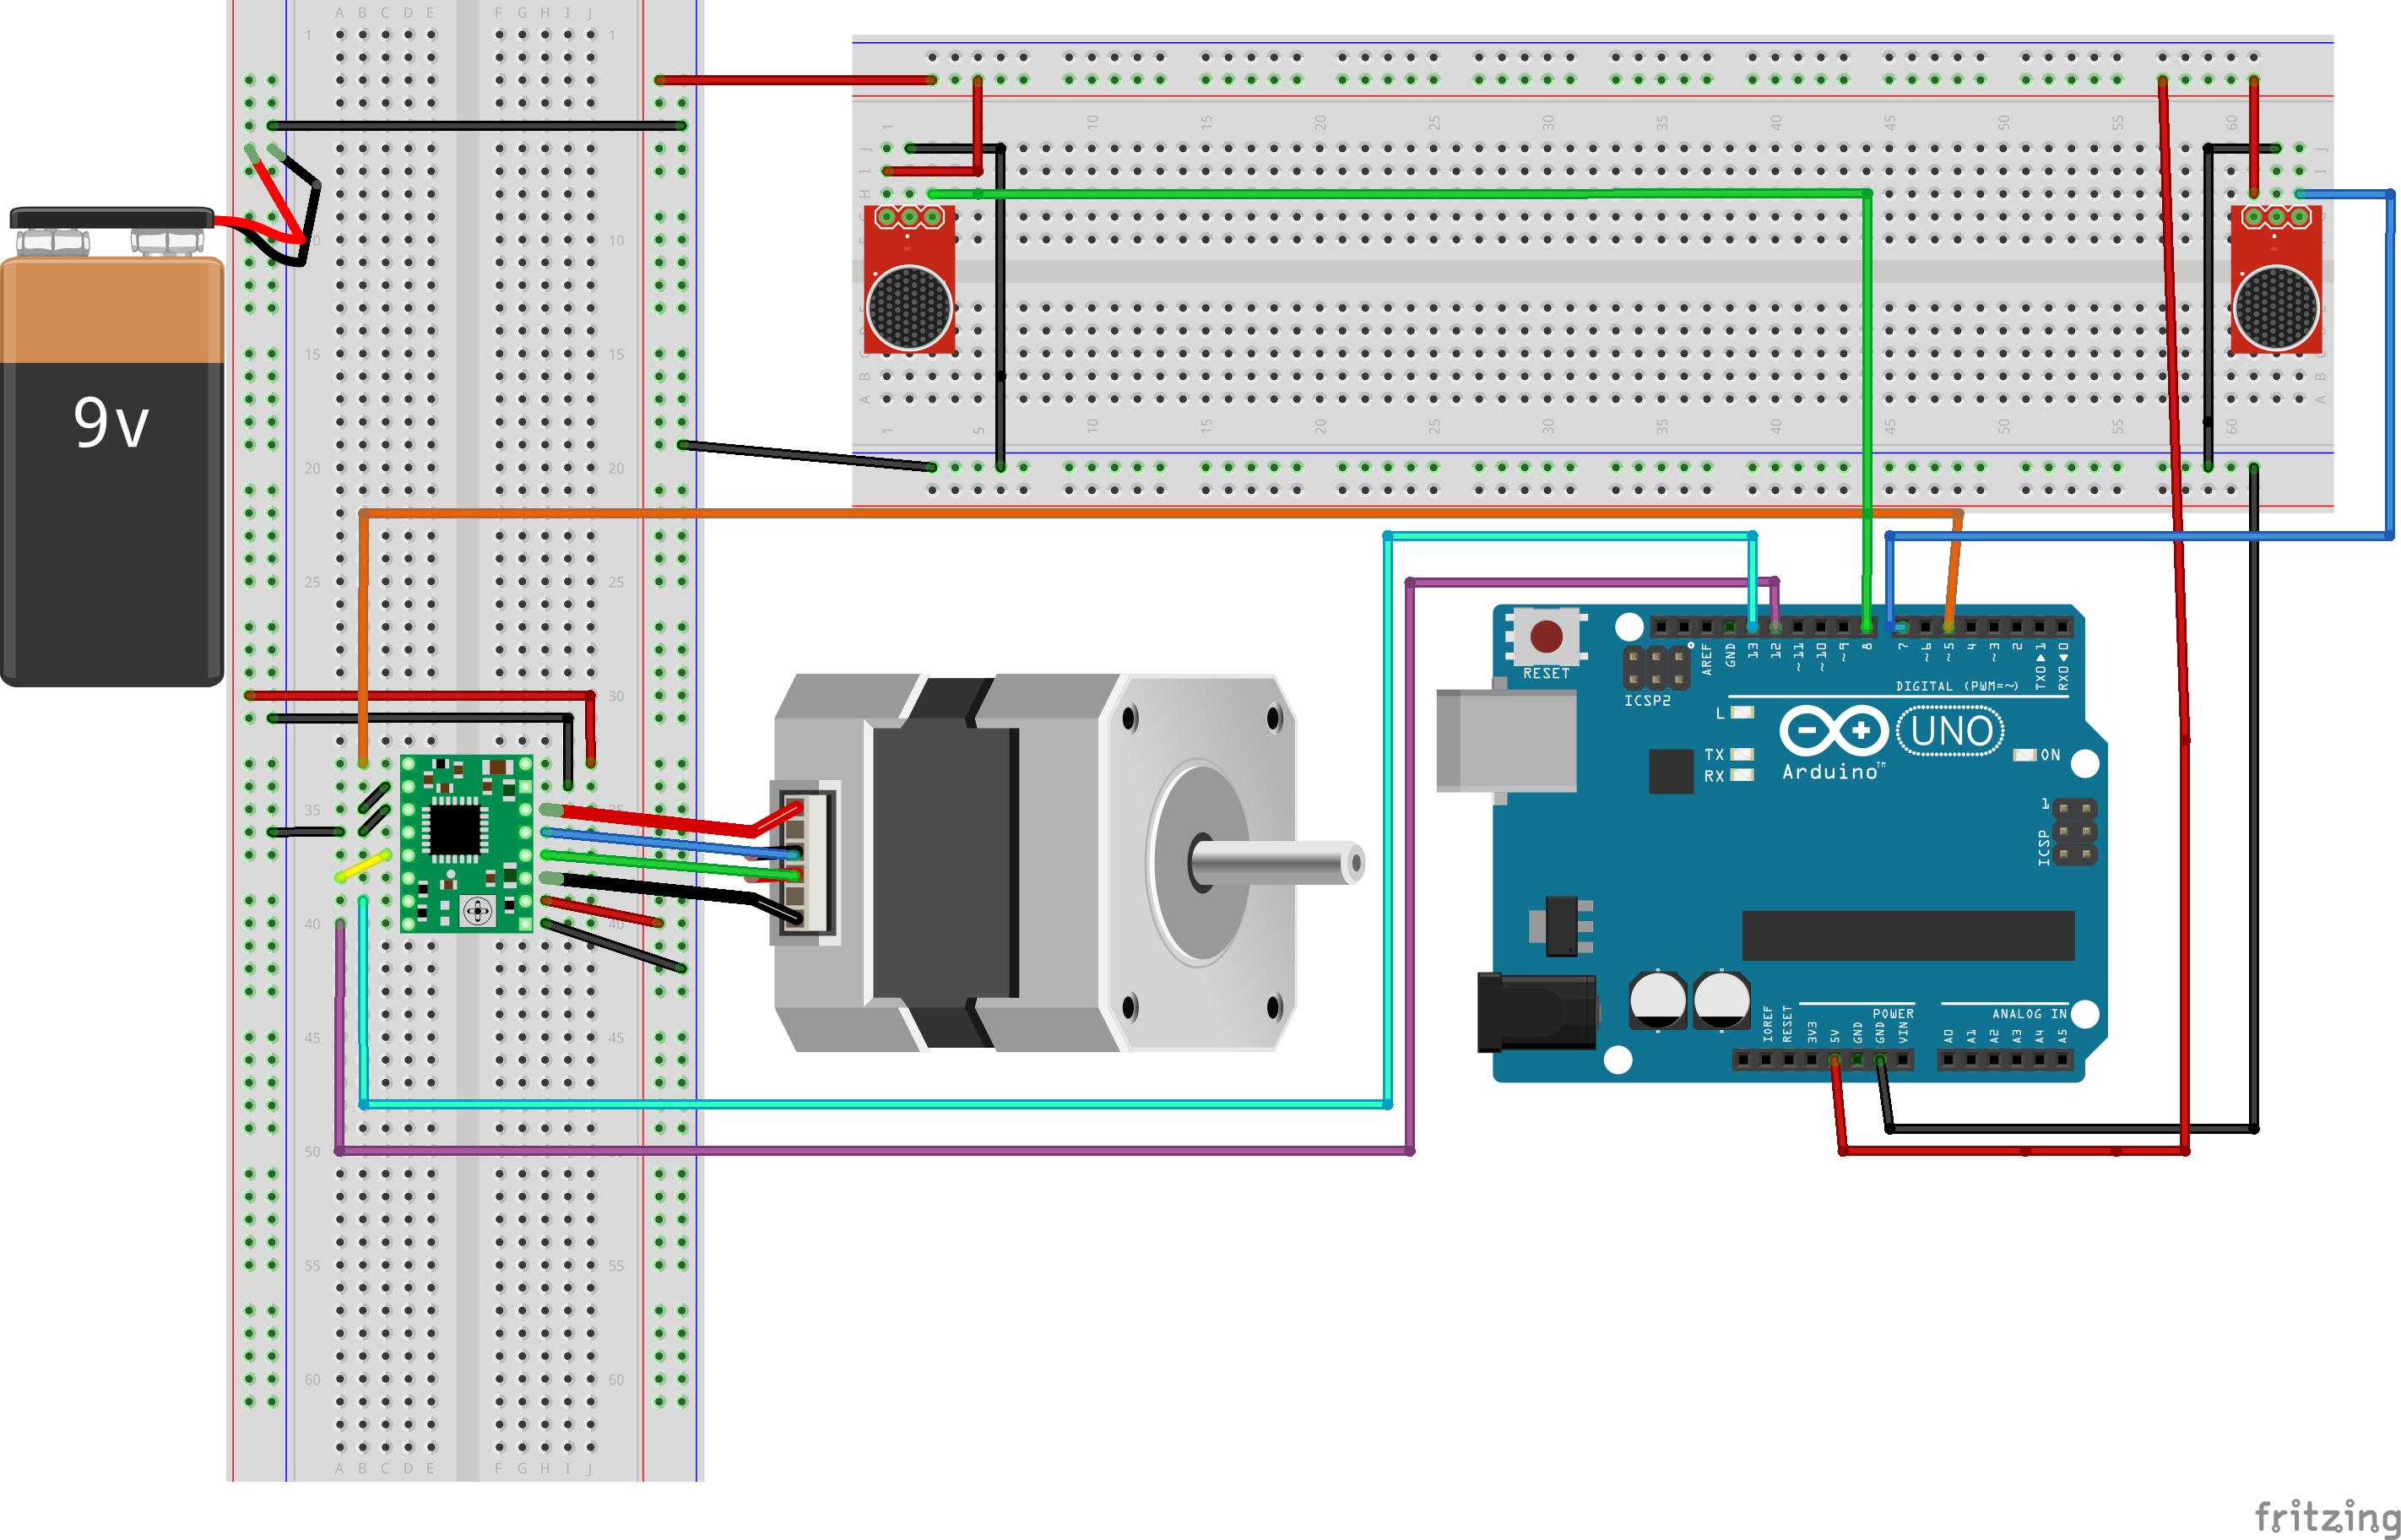 Sound directional finder with motion bb vk6c3qqhep